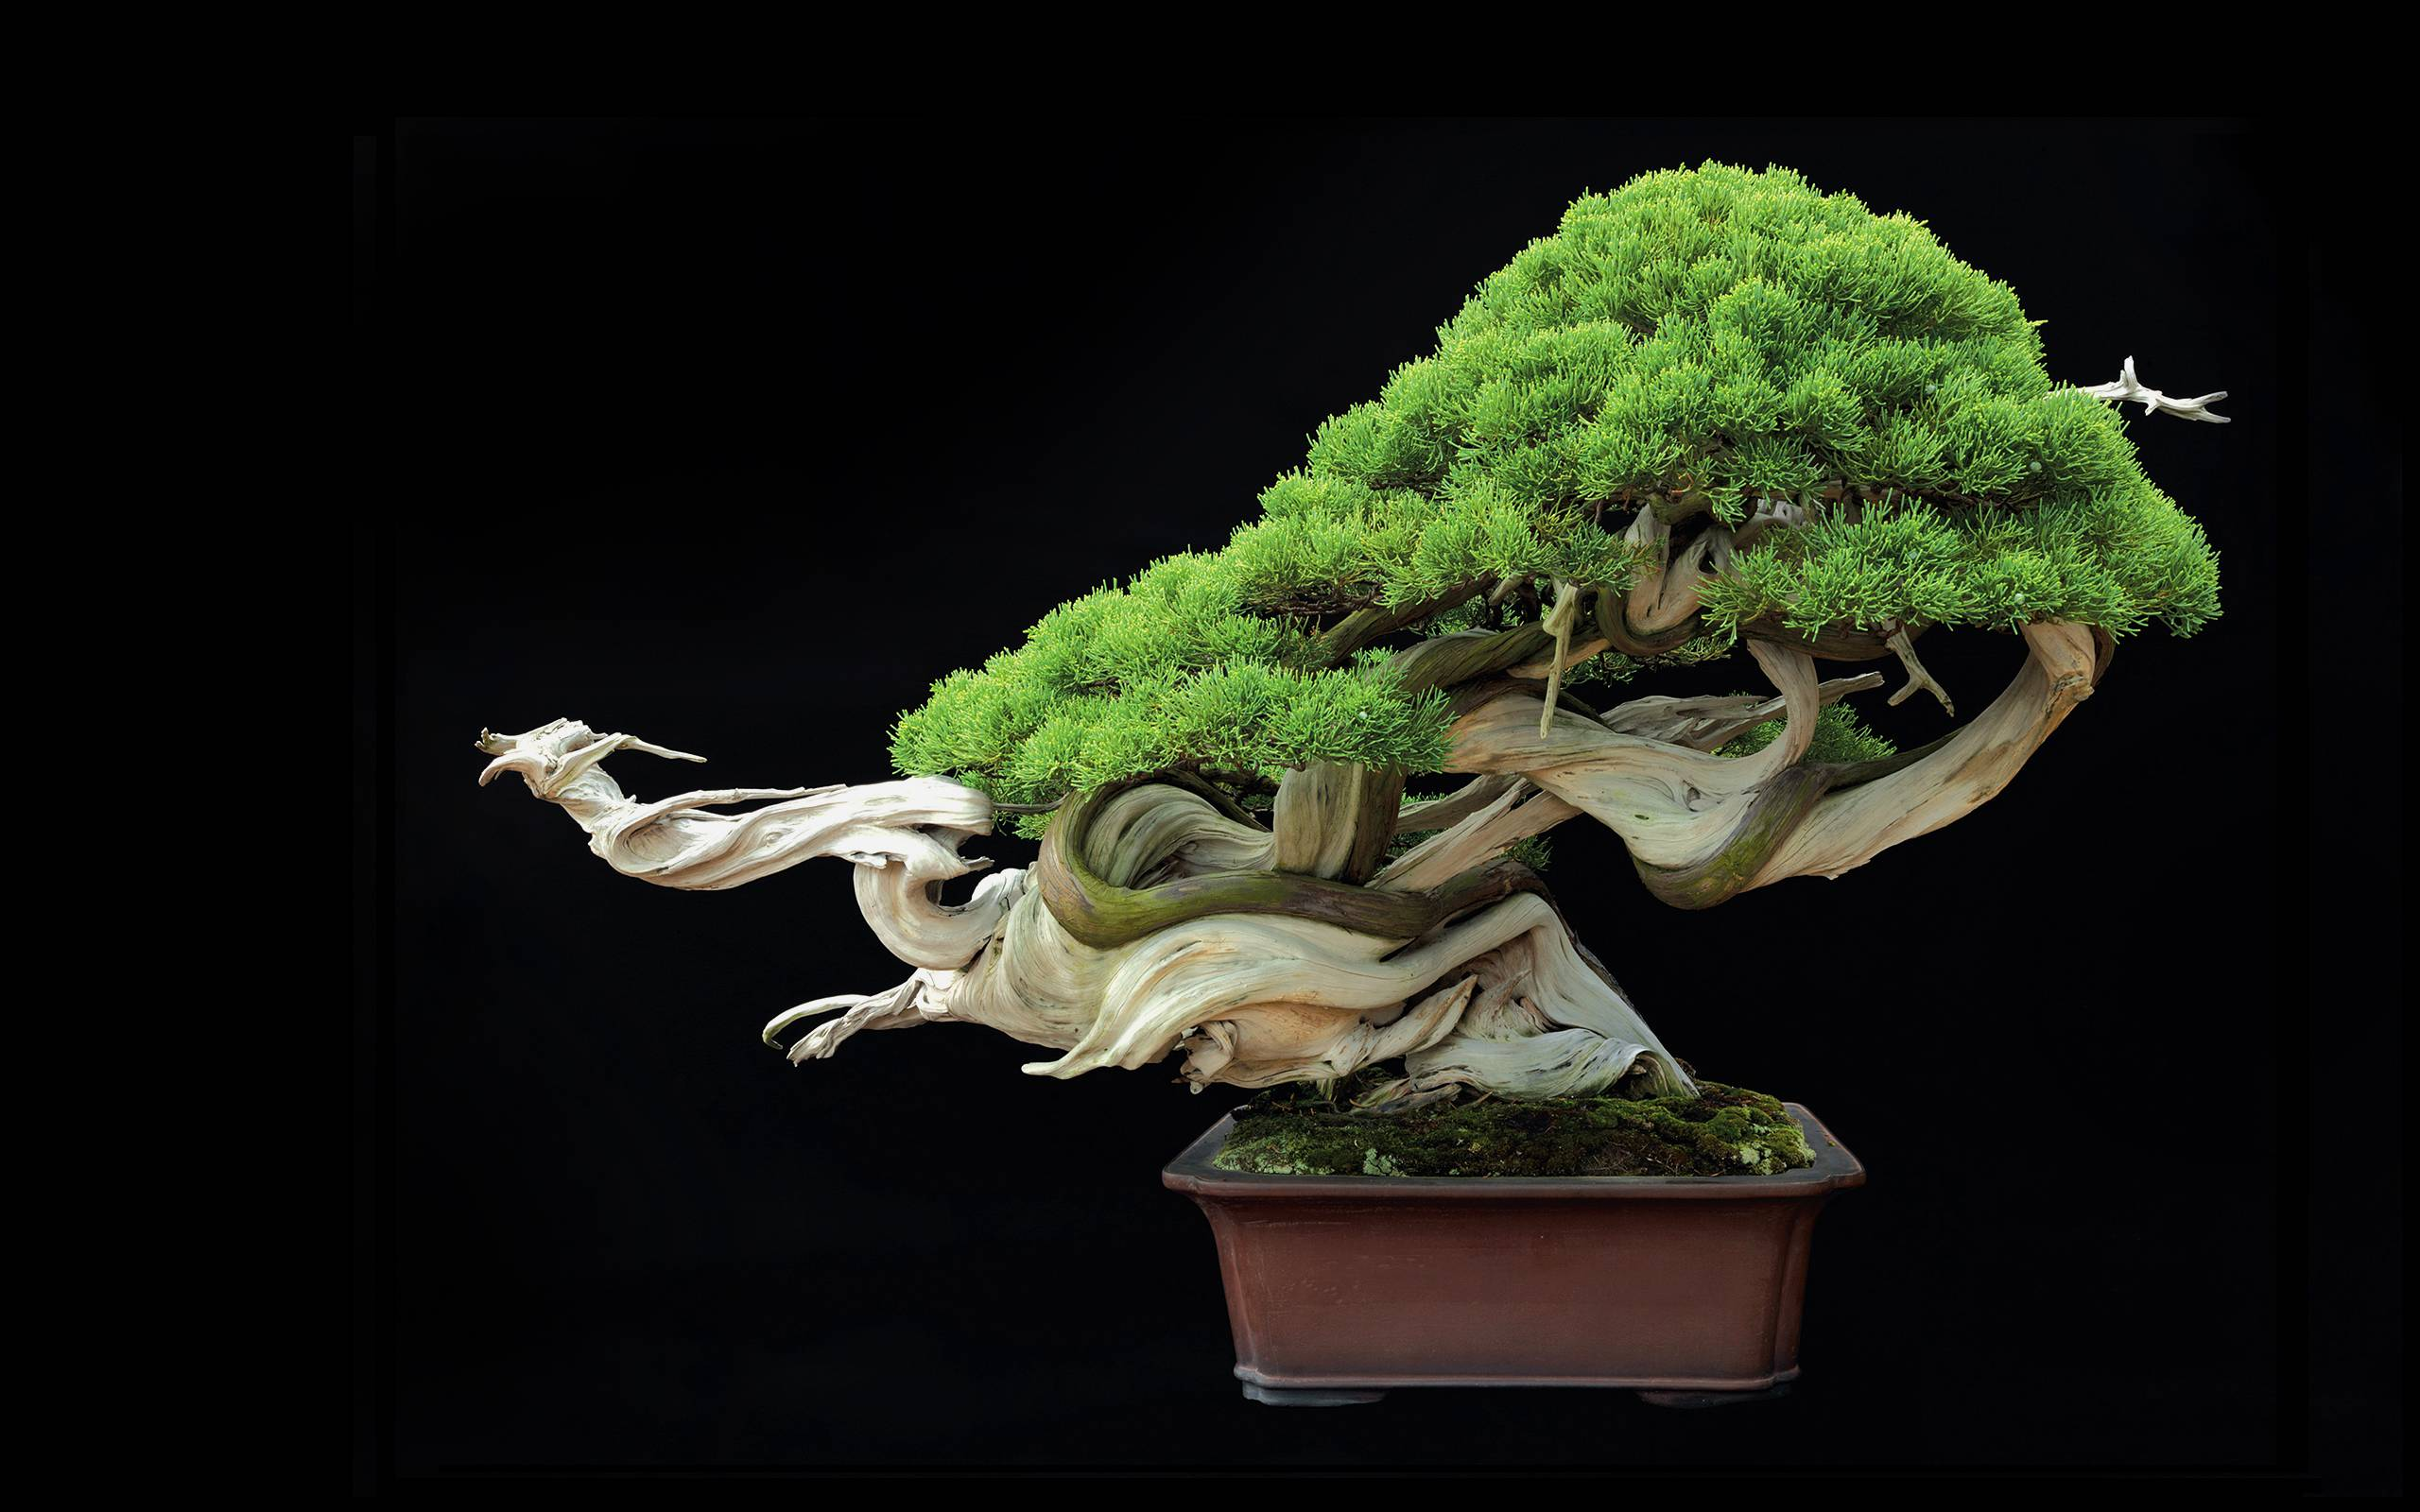 bonsai tree wallpapers wallpaper cave. Black Bedroom Furniture Sets. Home Design Ideas